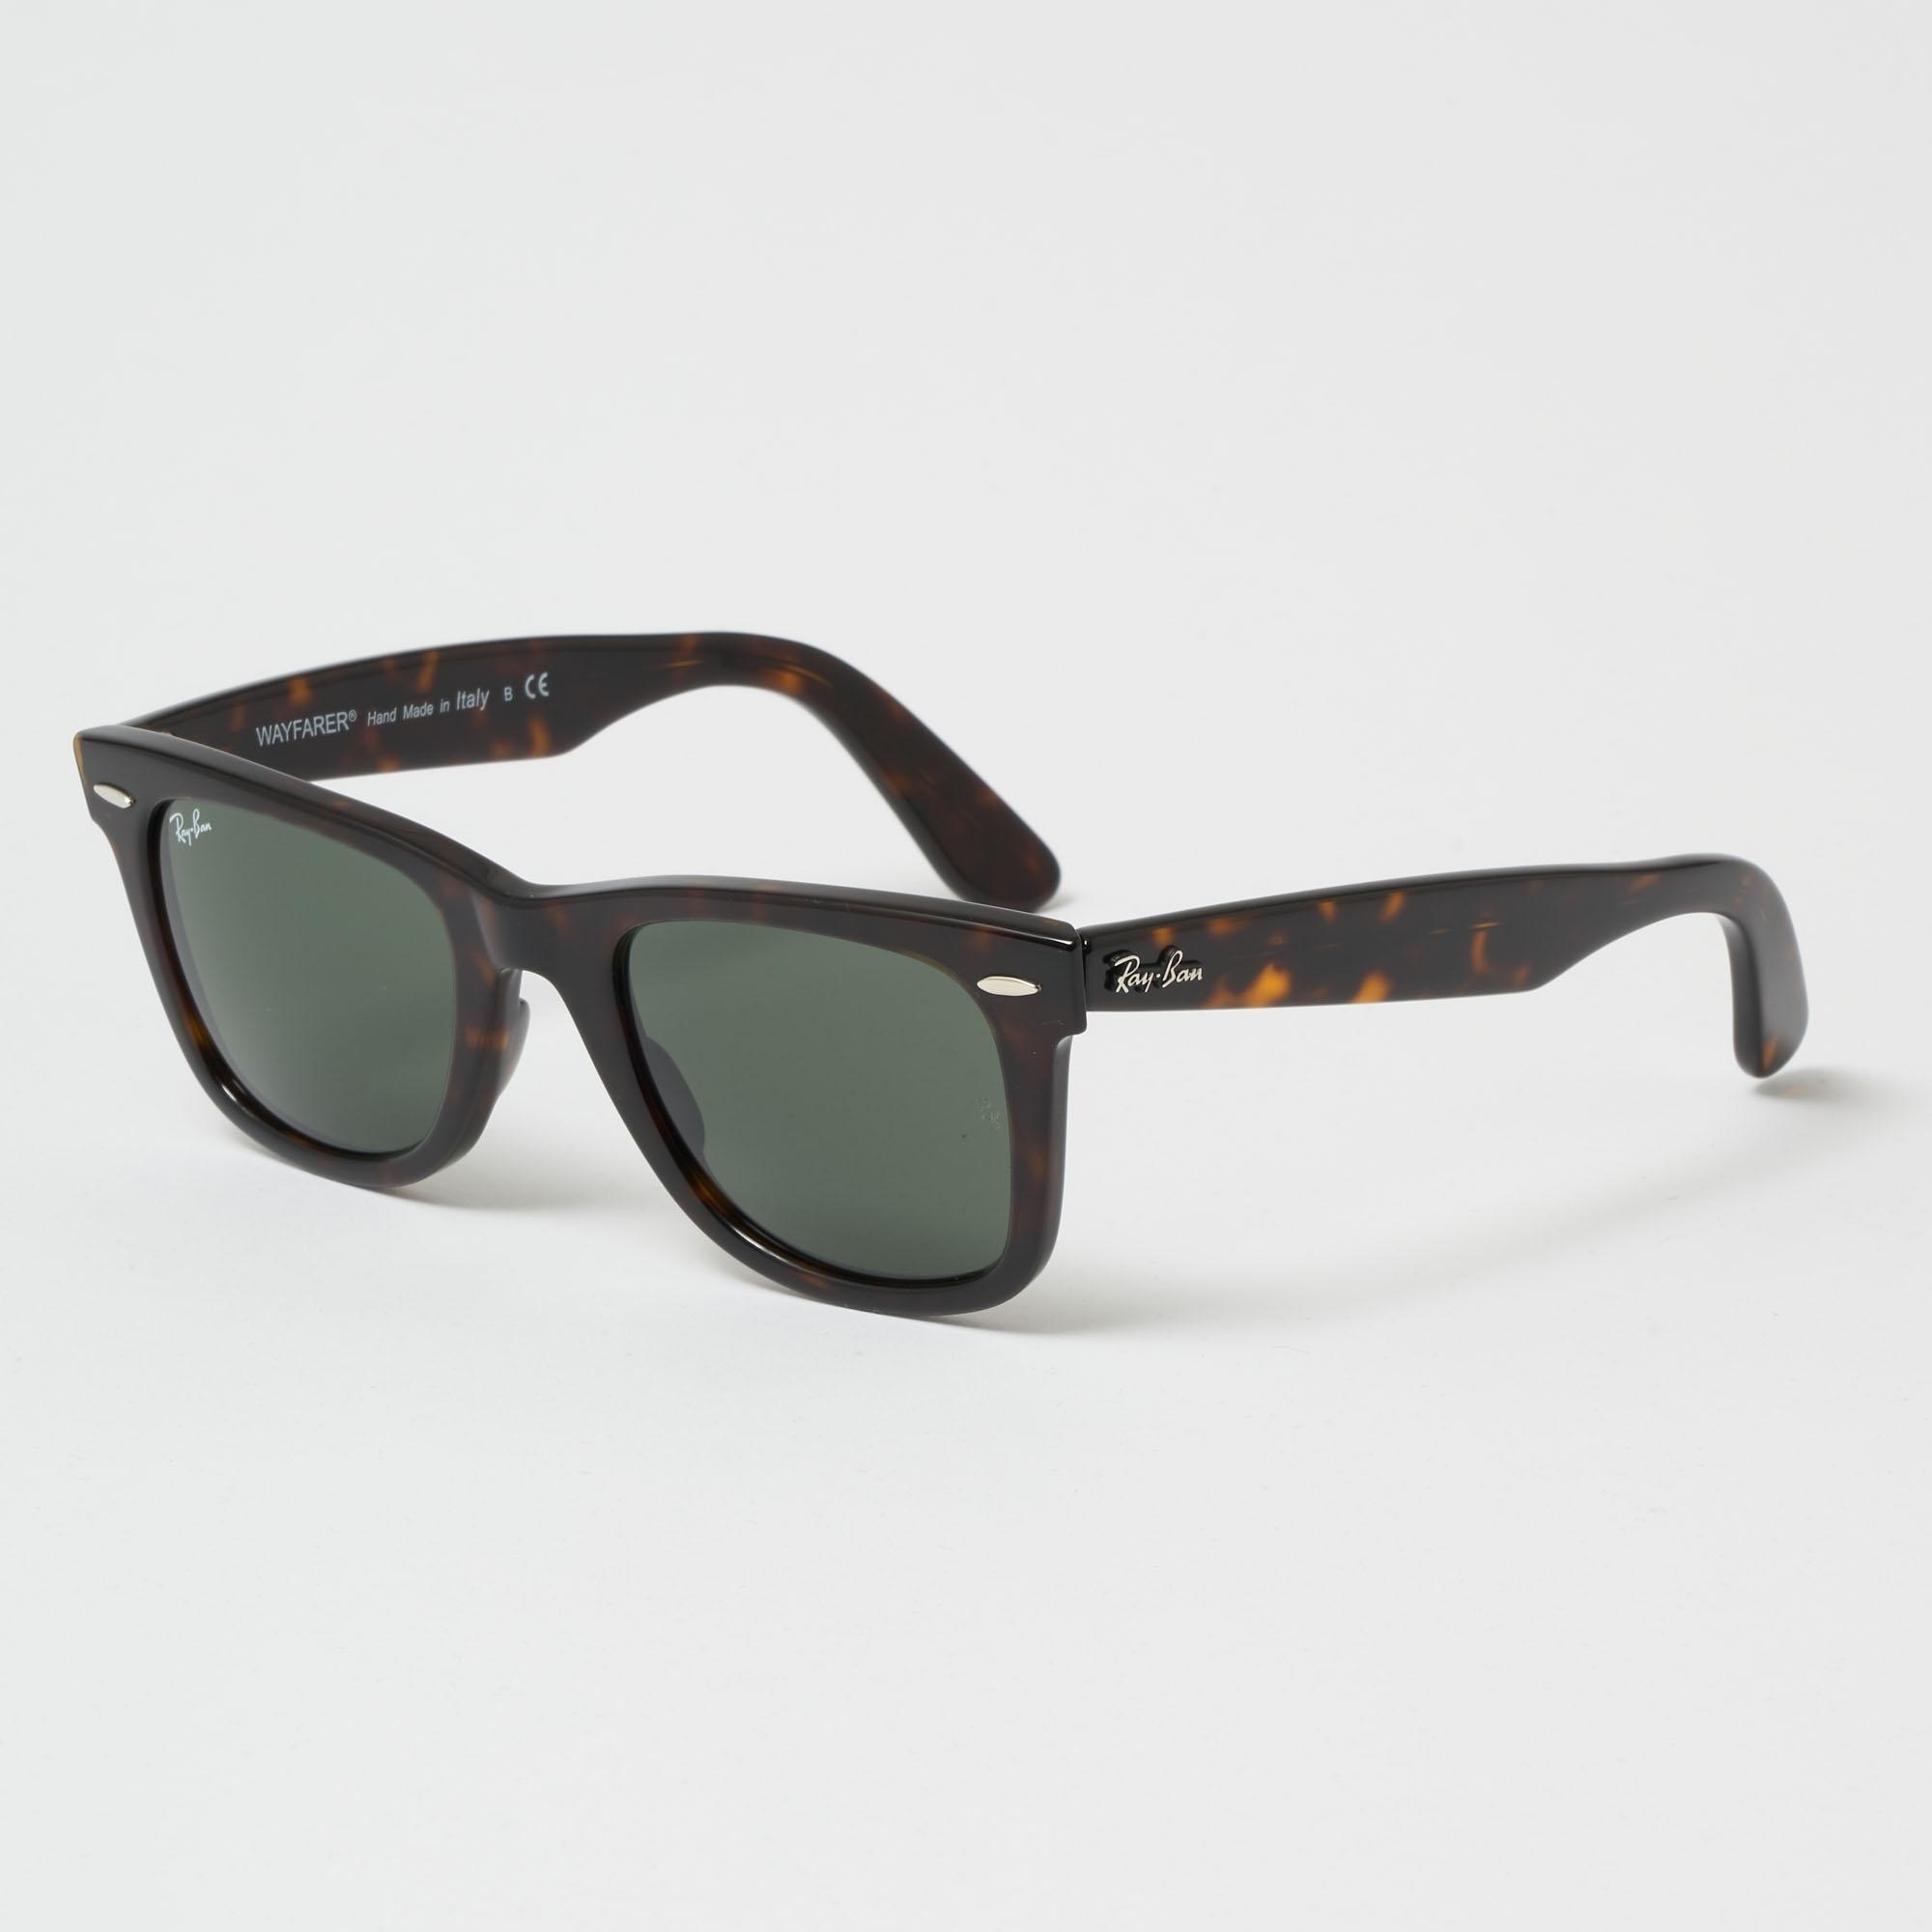 168acfdfdc Tortoise Original Wayfarer Classic Sunglasses - Green Classic G-15 Lenses